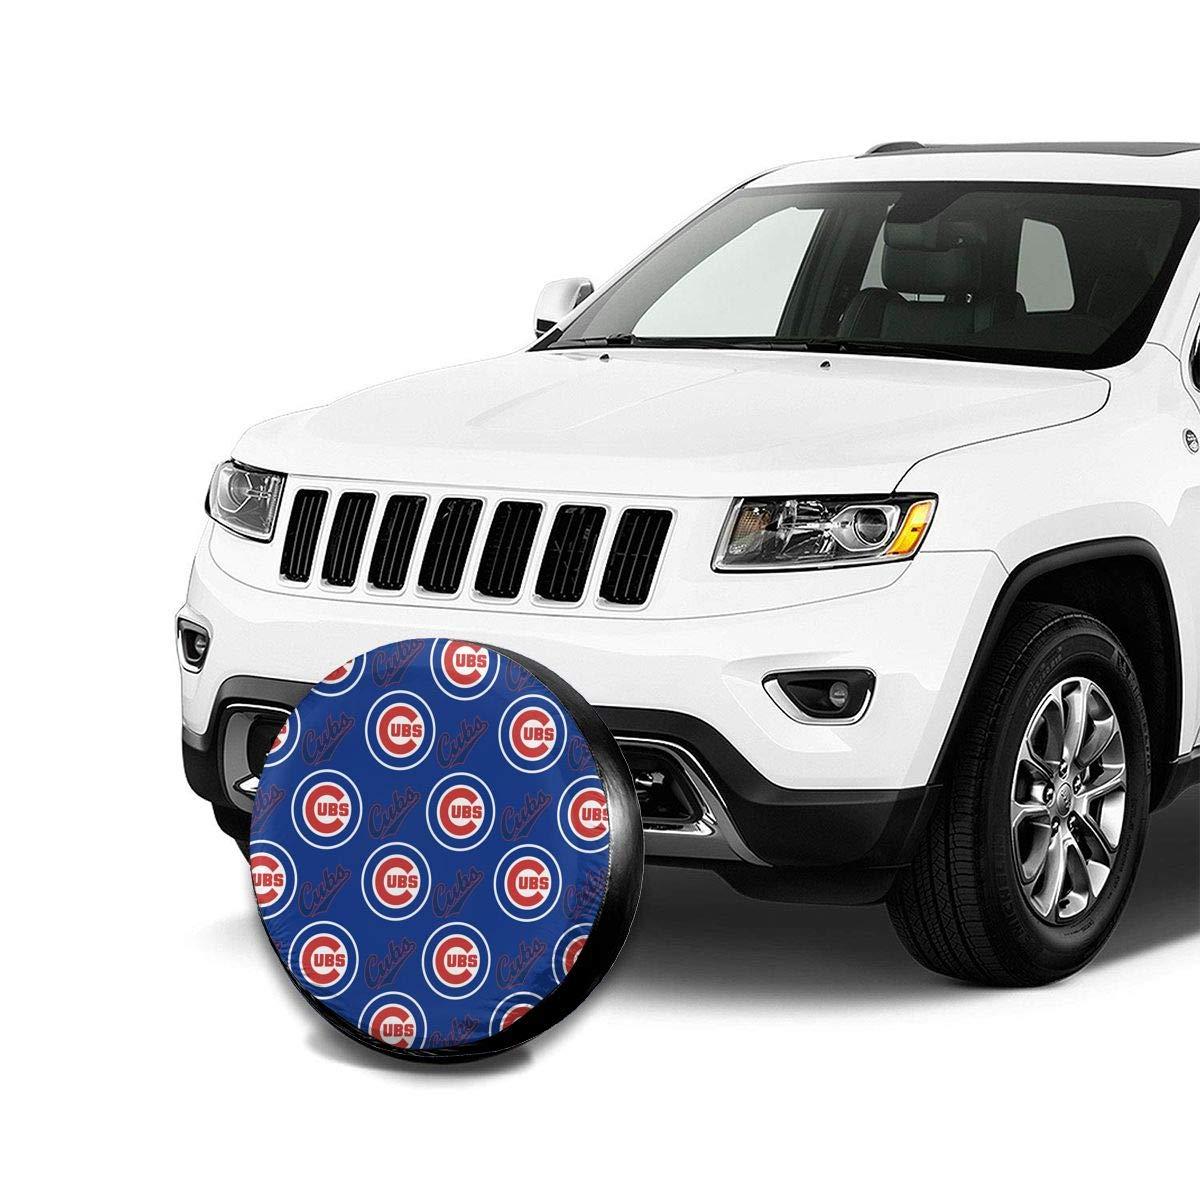 Waynejunior Chicago Spare Tire Cover Wheel Cover Universal Tire Covers for Jeep Trailer RV SUV Truck Camper Travel Trailer Accessories 17 Inch